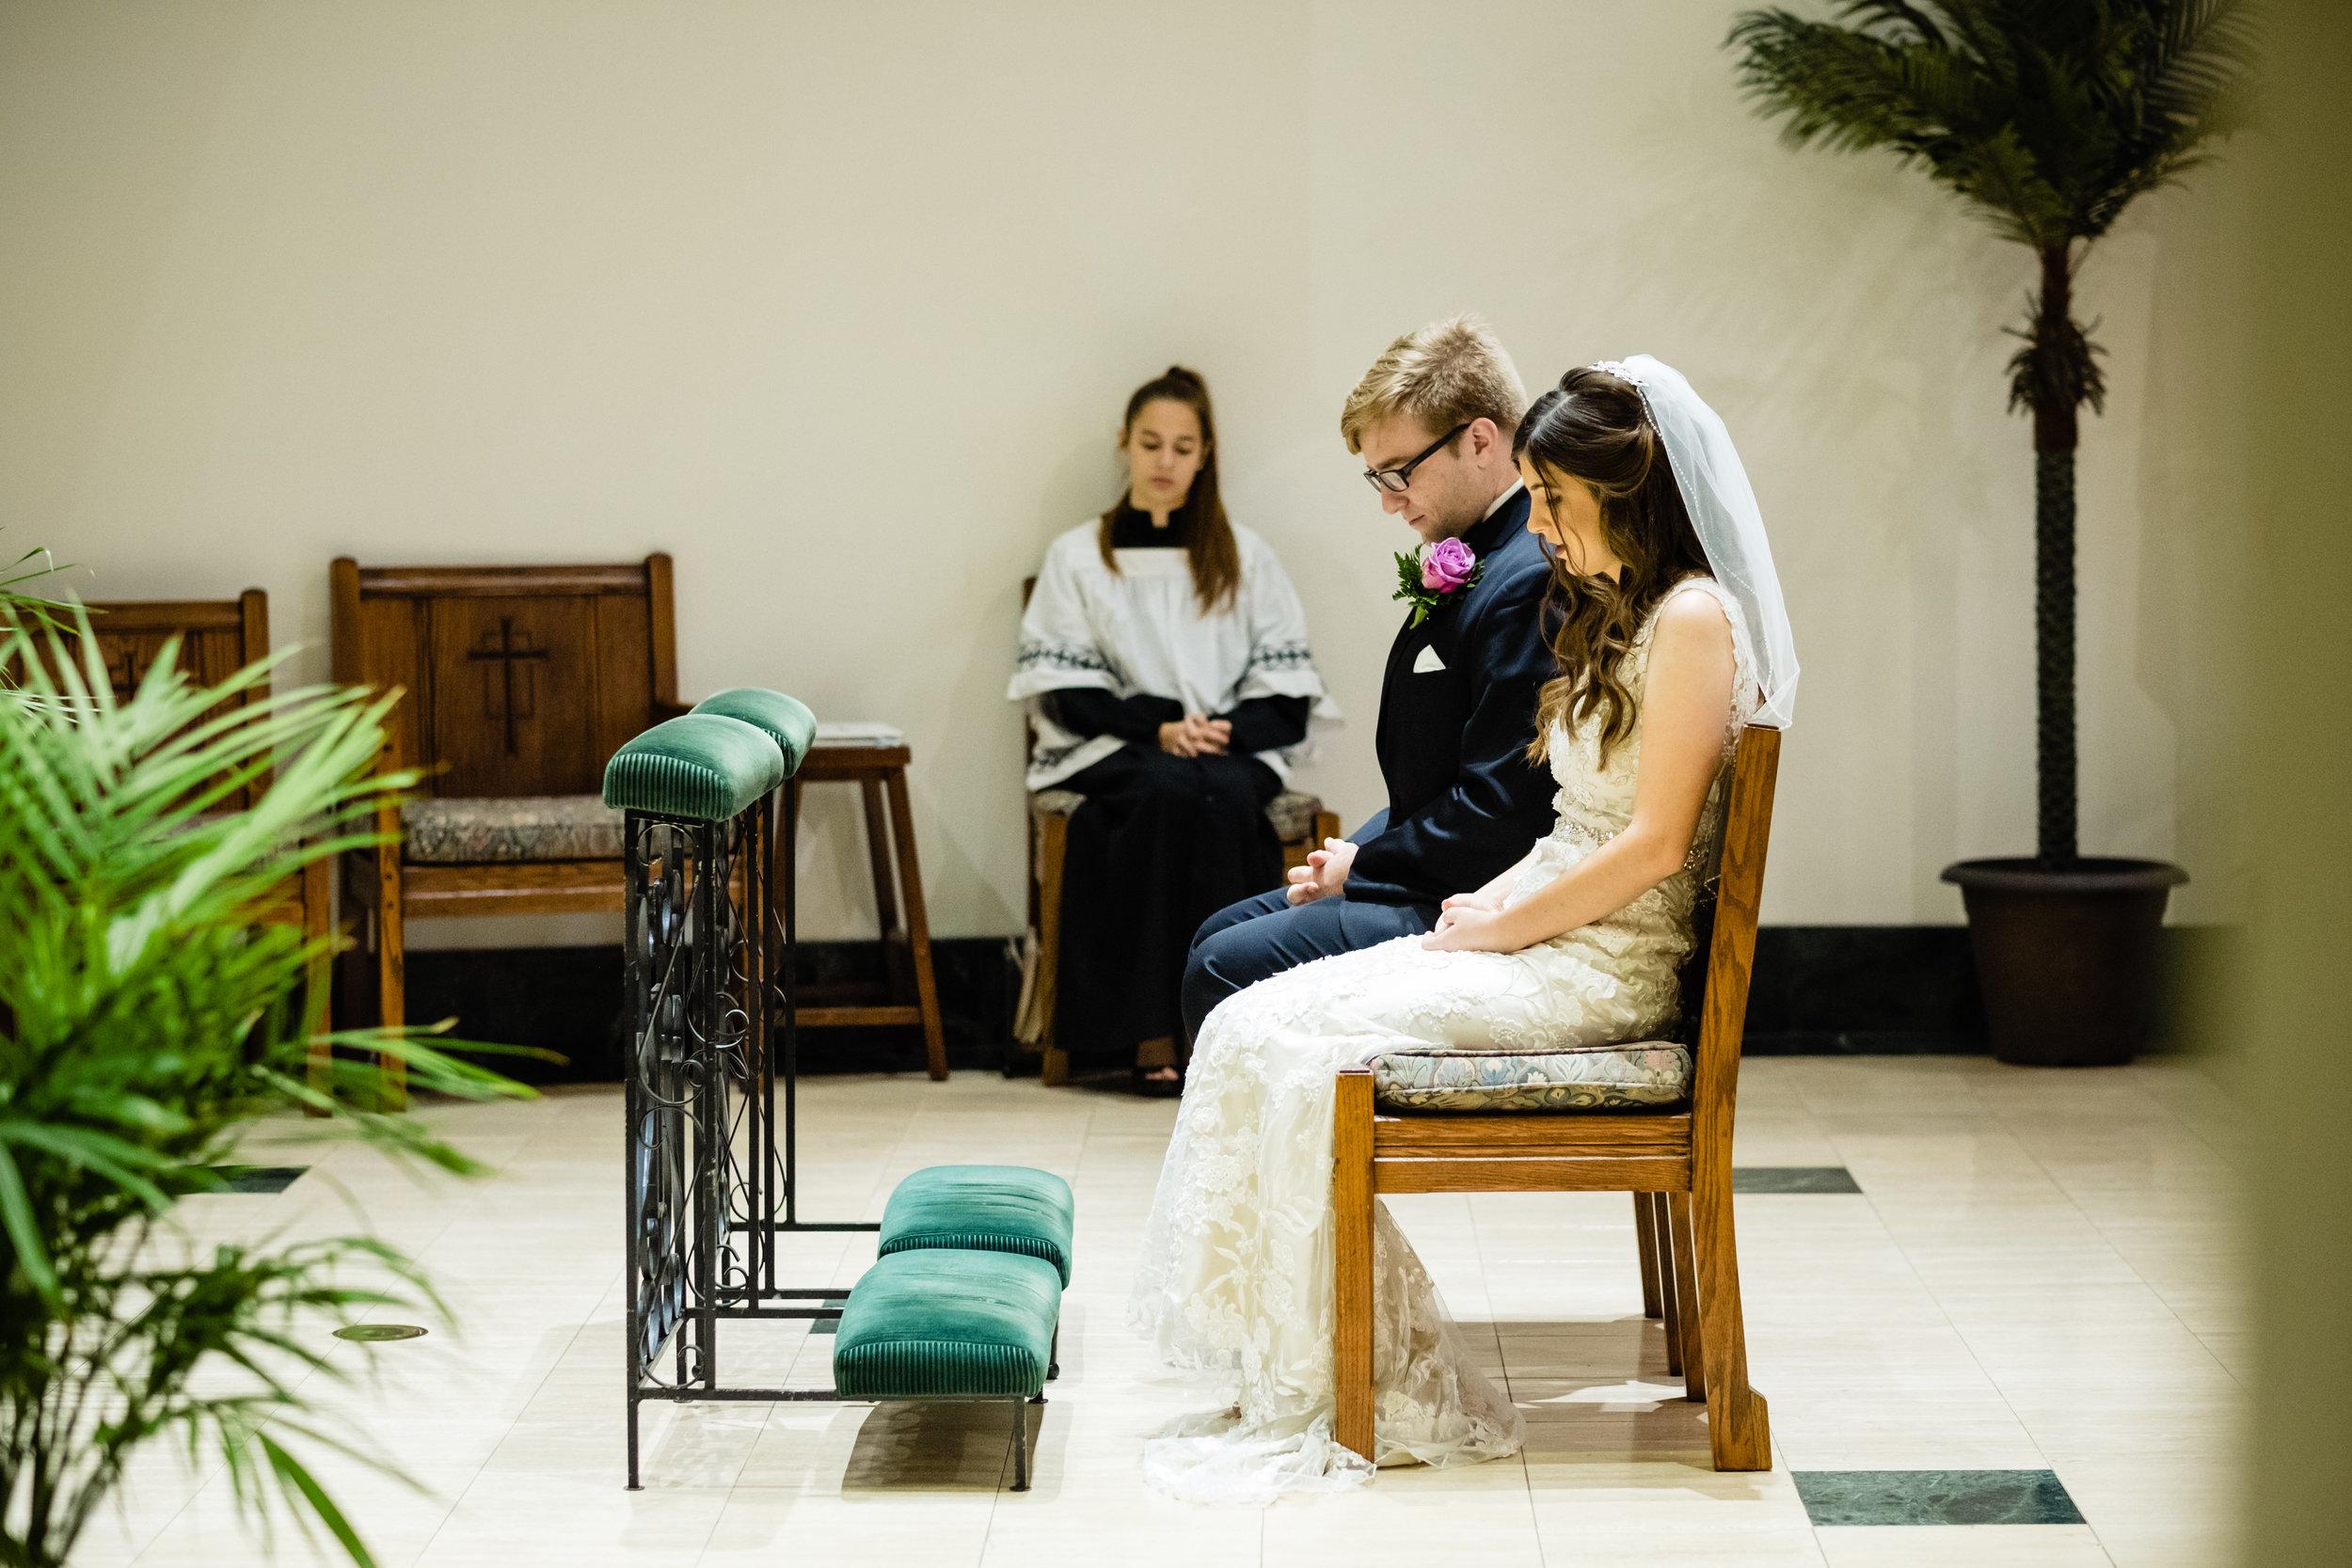 HAH_Zoe and Daniel_Clearwater Wedding_94_2018.jpg